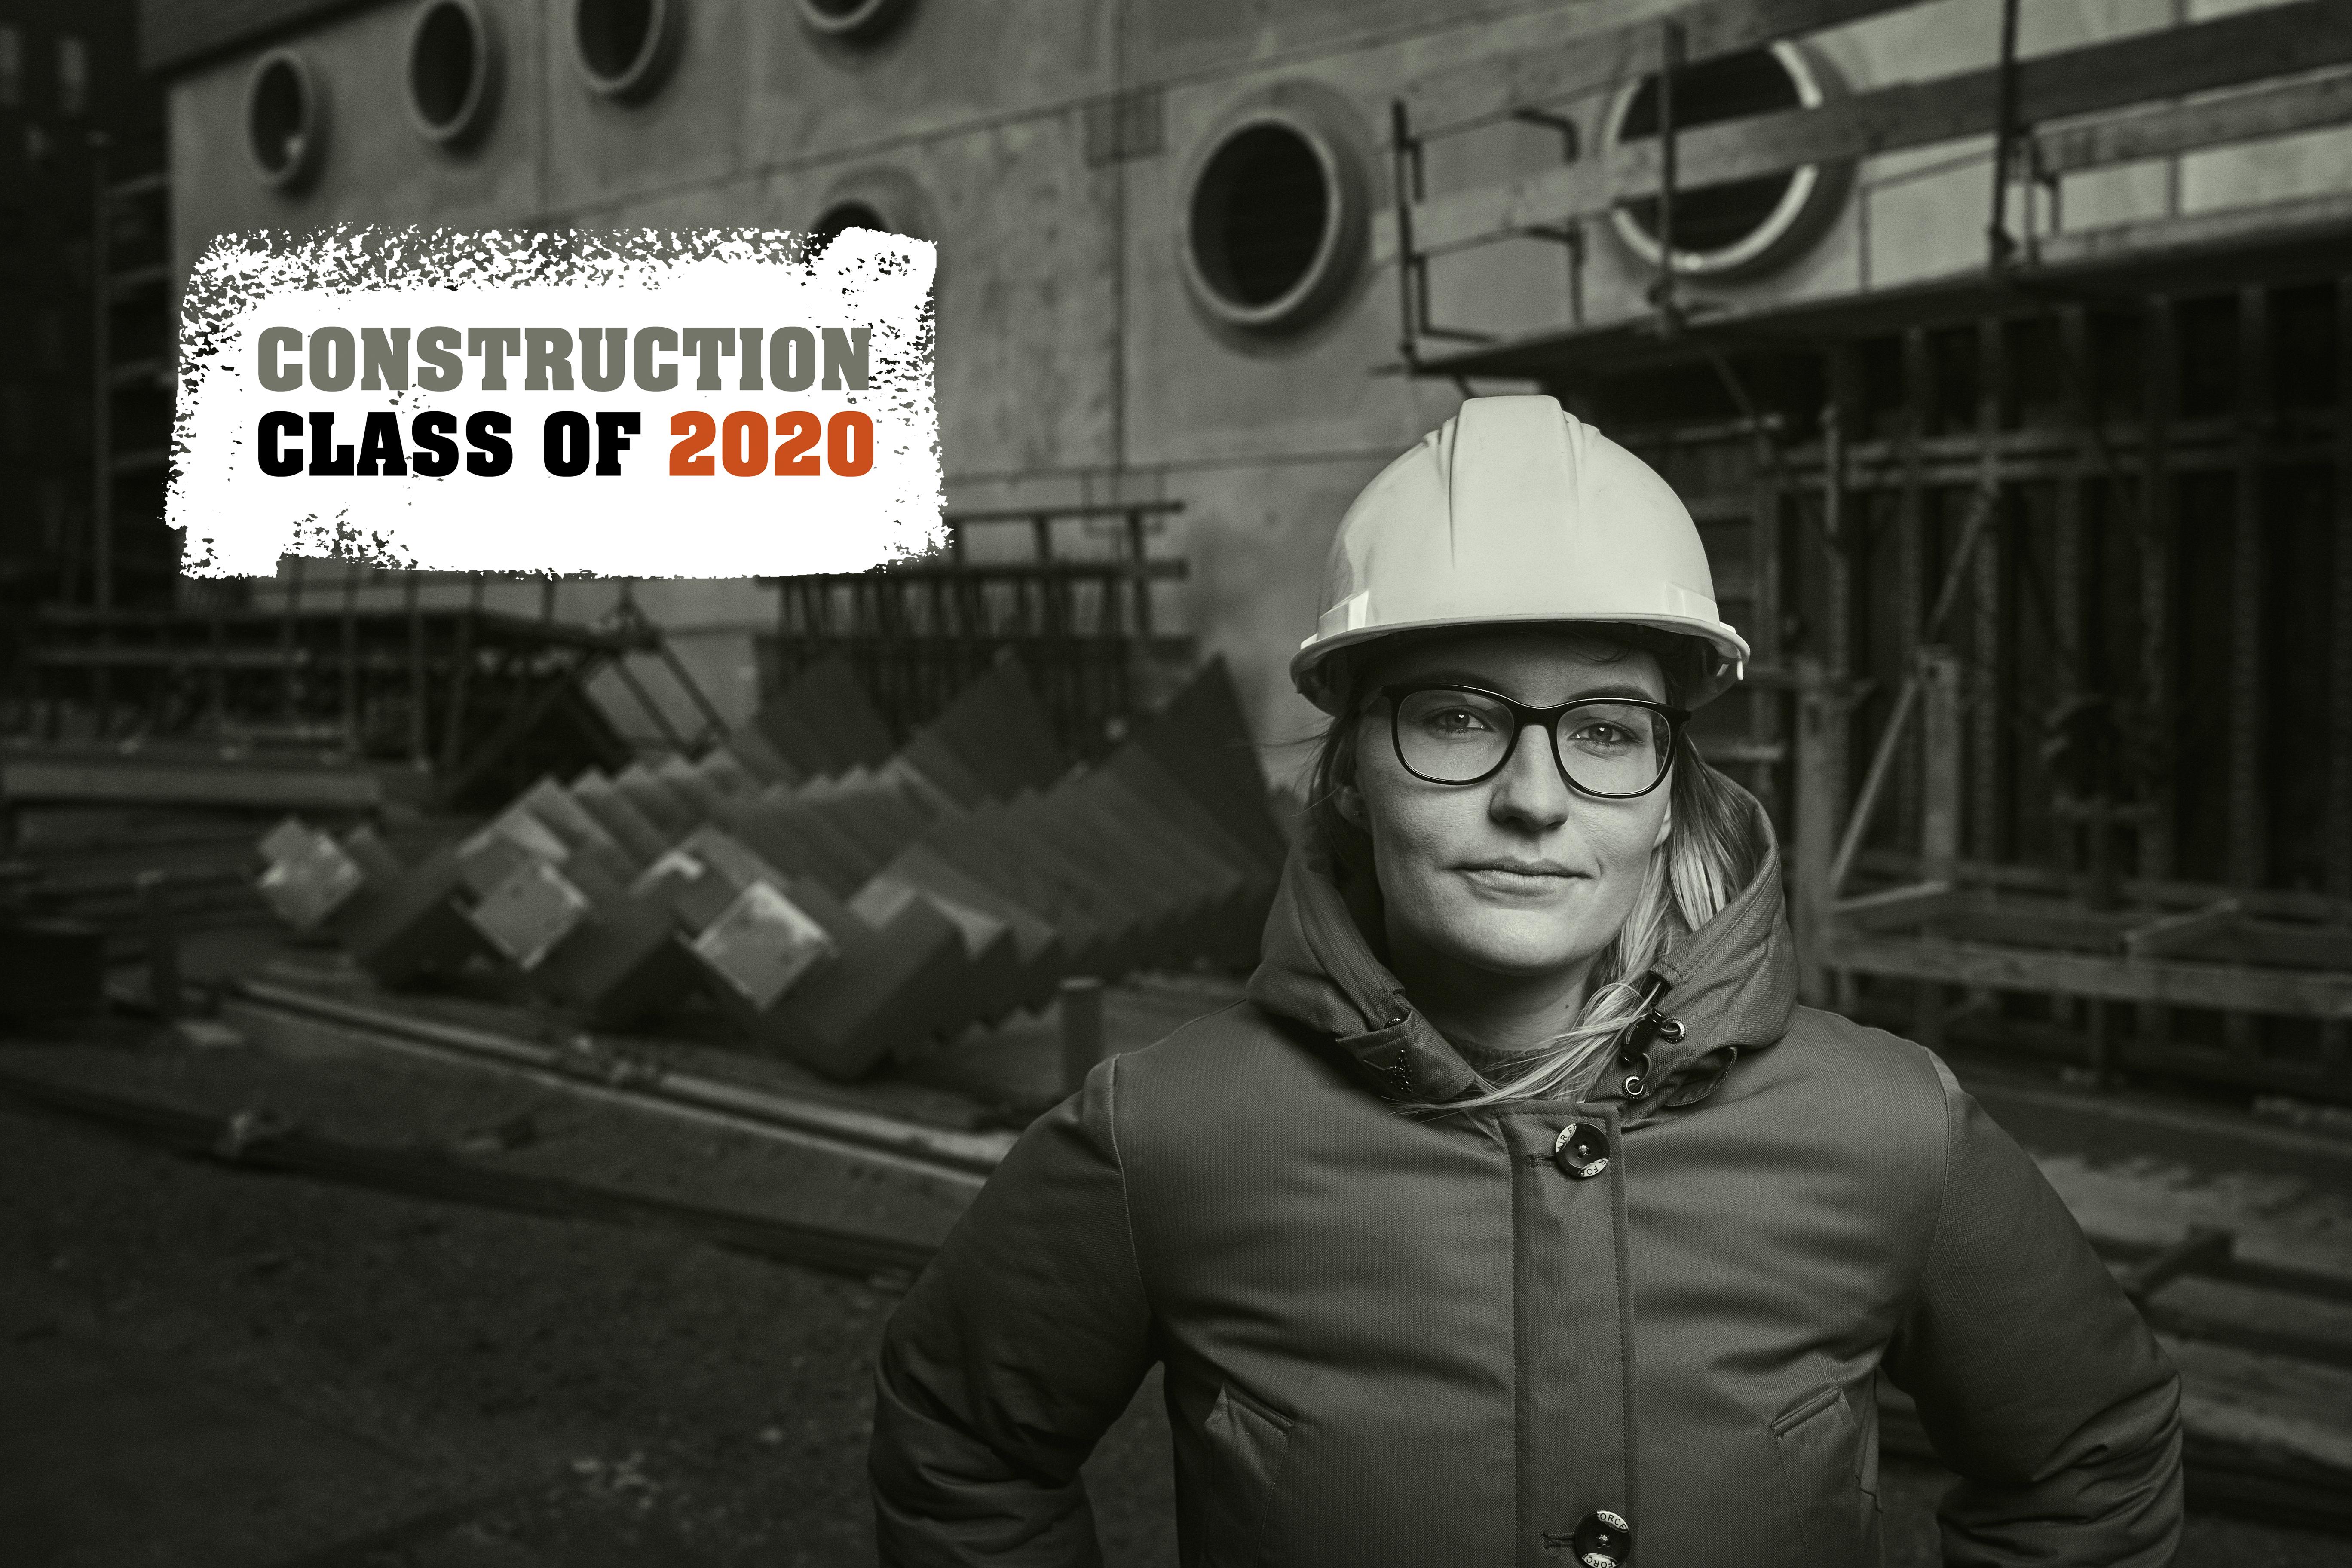 Construction-Class-visual.jpg